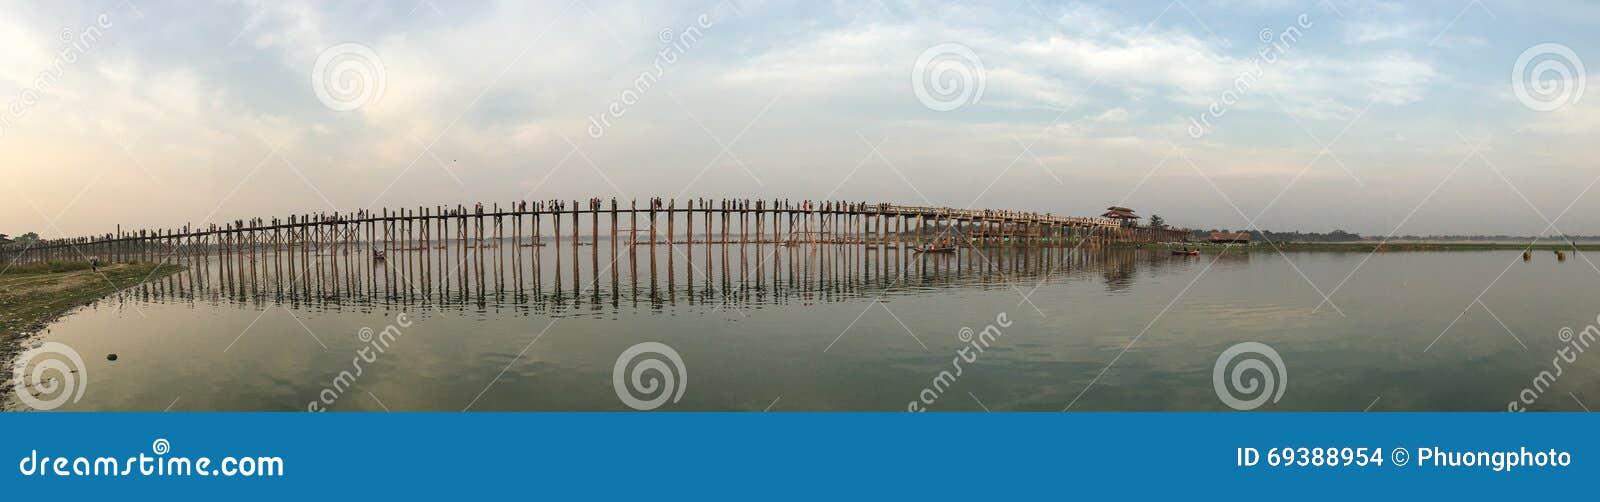 Панорама моста Ubein в Мандалае, Мьянме